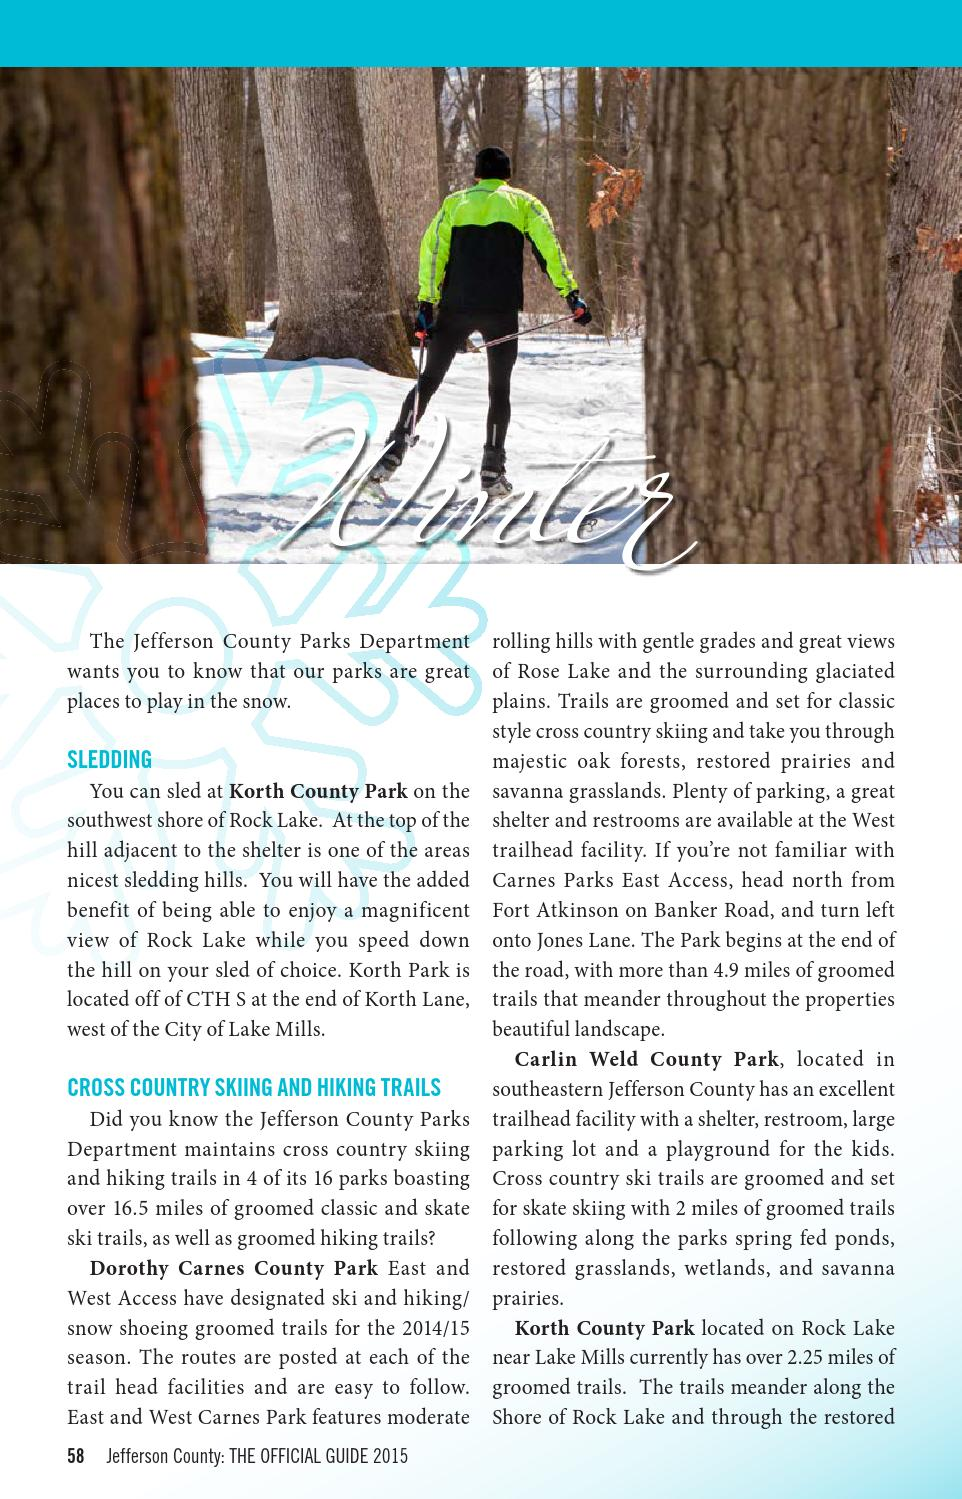 2015 Jefferson County Wisconsin Official Guide by Jennifer